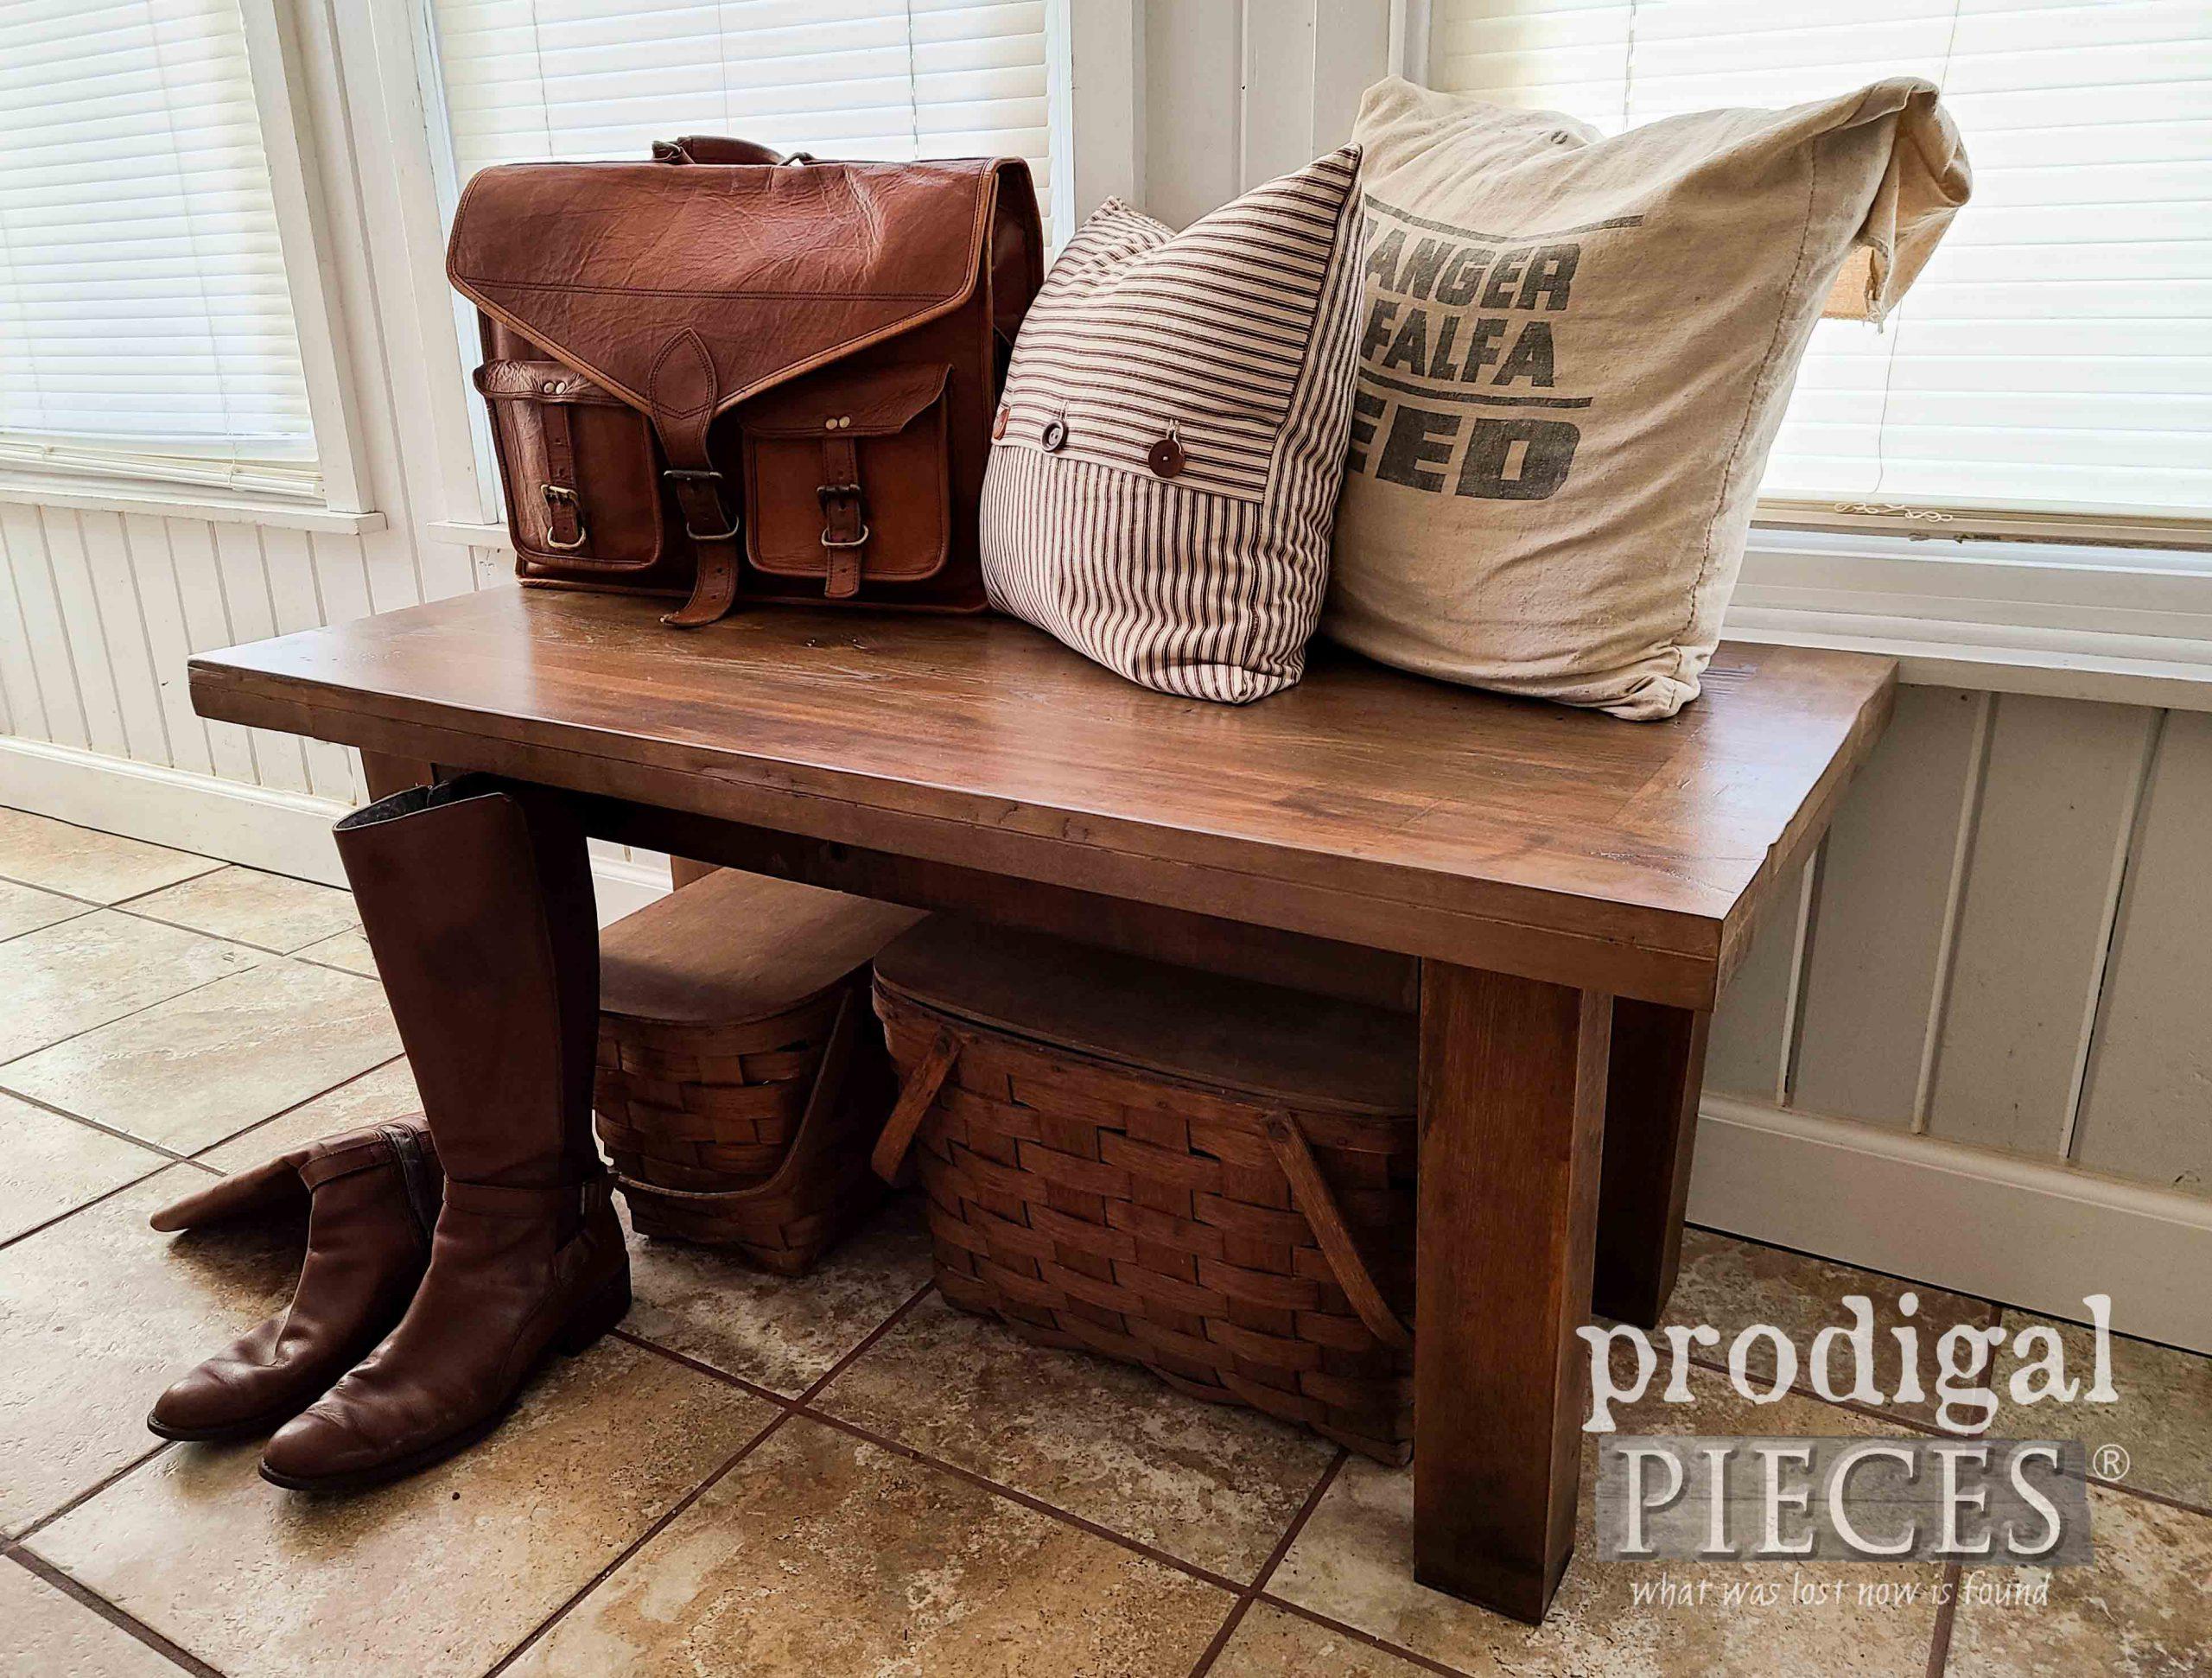 Repurposed Farmhouse Bench made by Larissa of Prodigal Pieces   prodigalpieces.com #prodigalpieces #farmhouse #furniture #home #homedecor